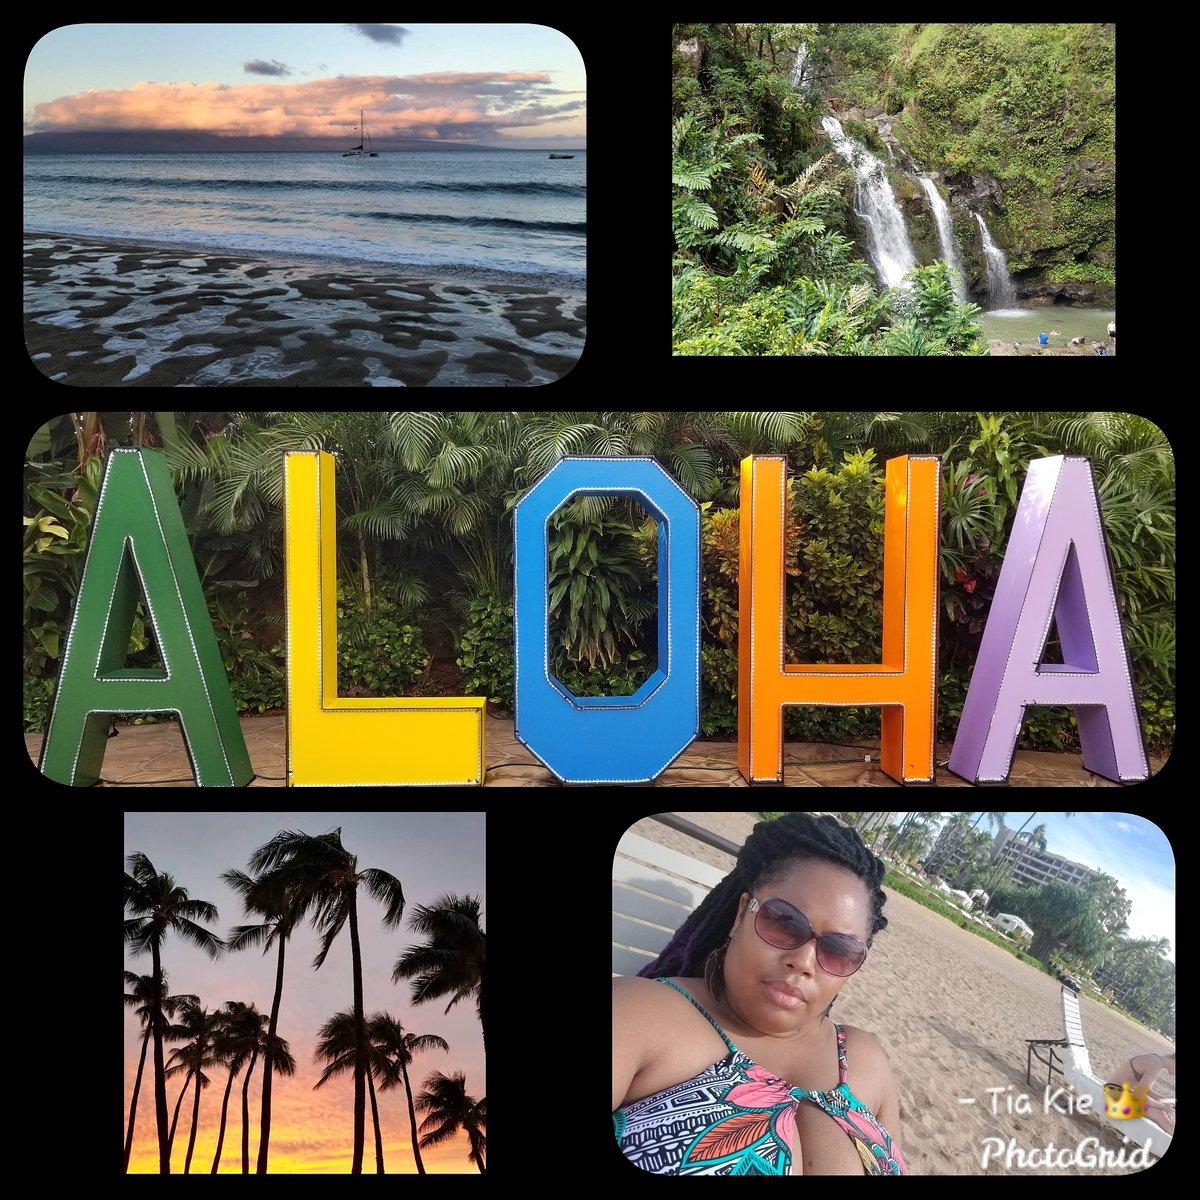 Take me back.... . . . #takebeback #maui #hawaii #divakie #DivaKieonthemove #DivaKieinHawaii #Keys2Travel #imovedifferent #runningwanderer #beachdreams #waterfalls #sunset #outdoors #exploringtheglobe #girlslovetravel #beautifuldestinationspic.twitter.com/7F9hAtlHbP